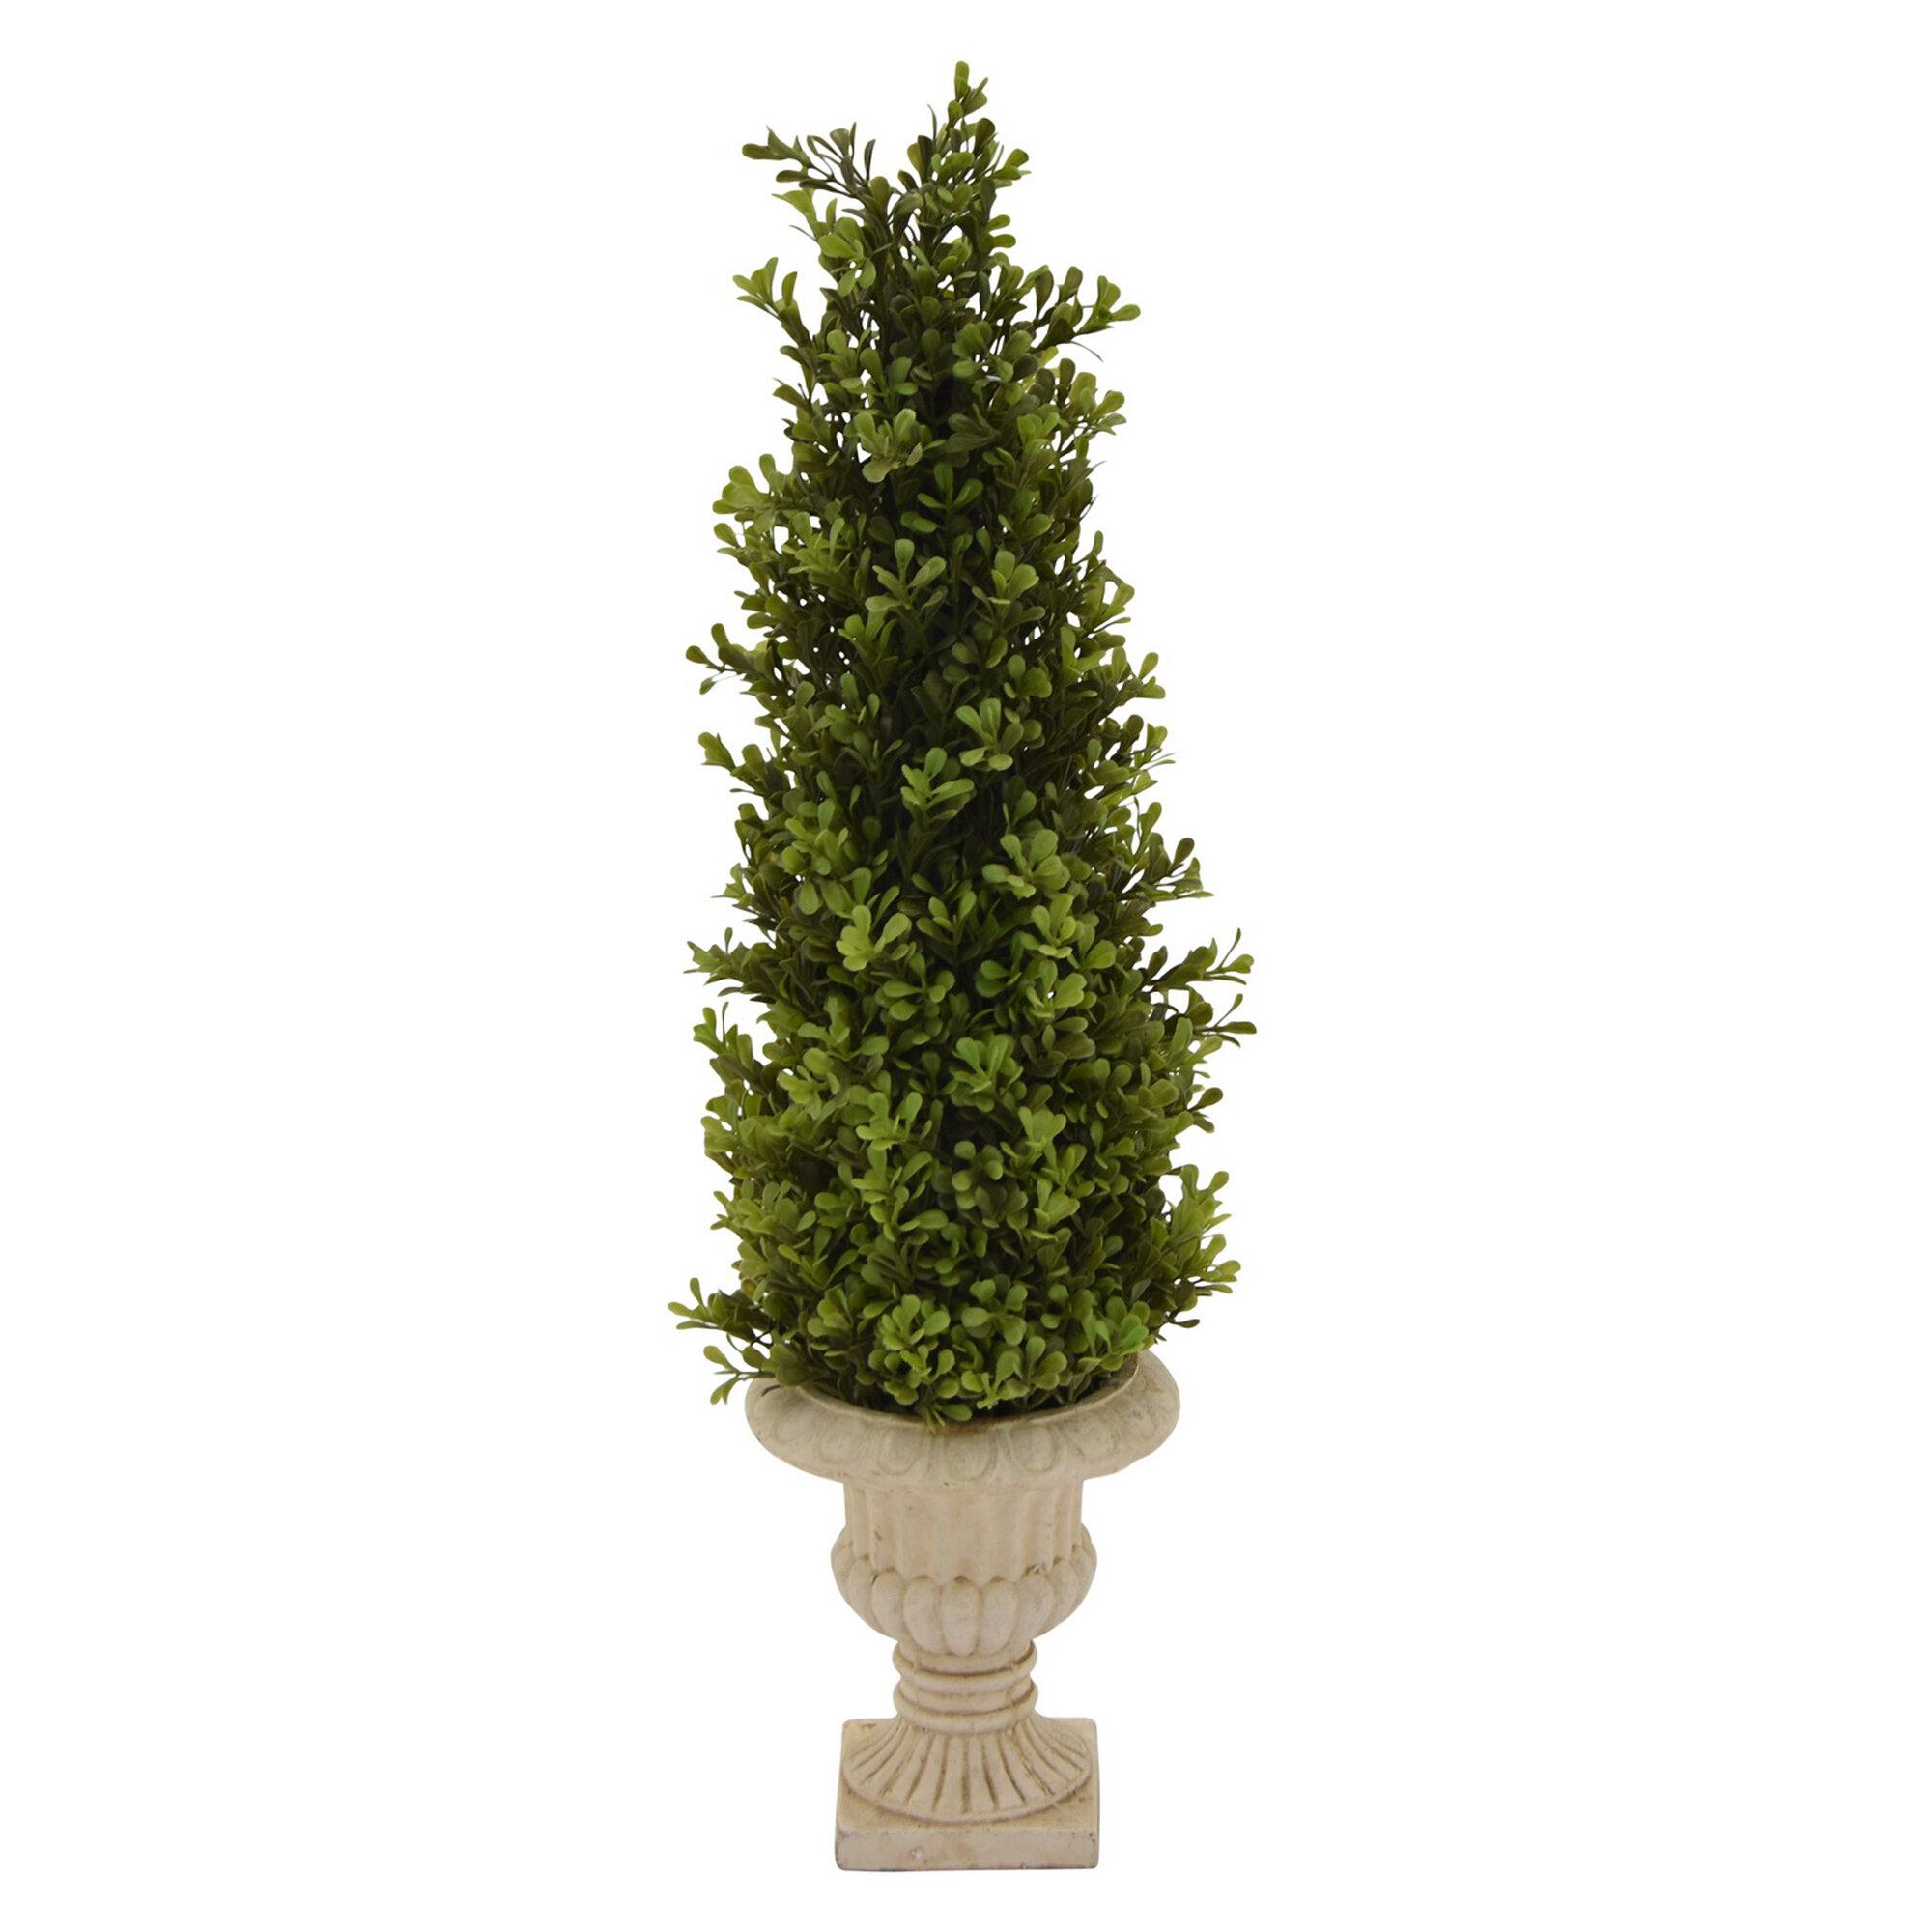 Charlton Home Faux Boxwood Topiary In Pot Wayfair